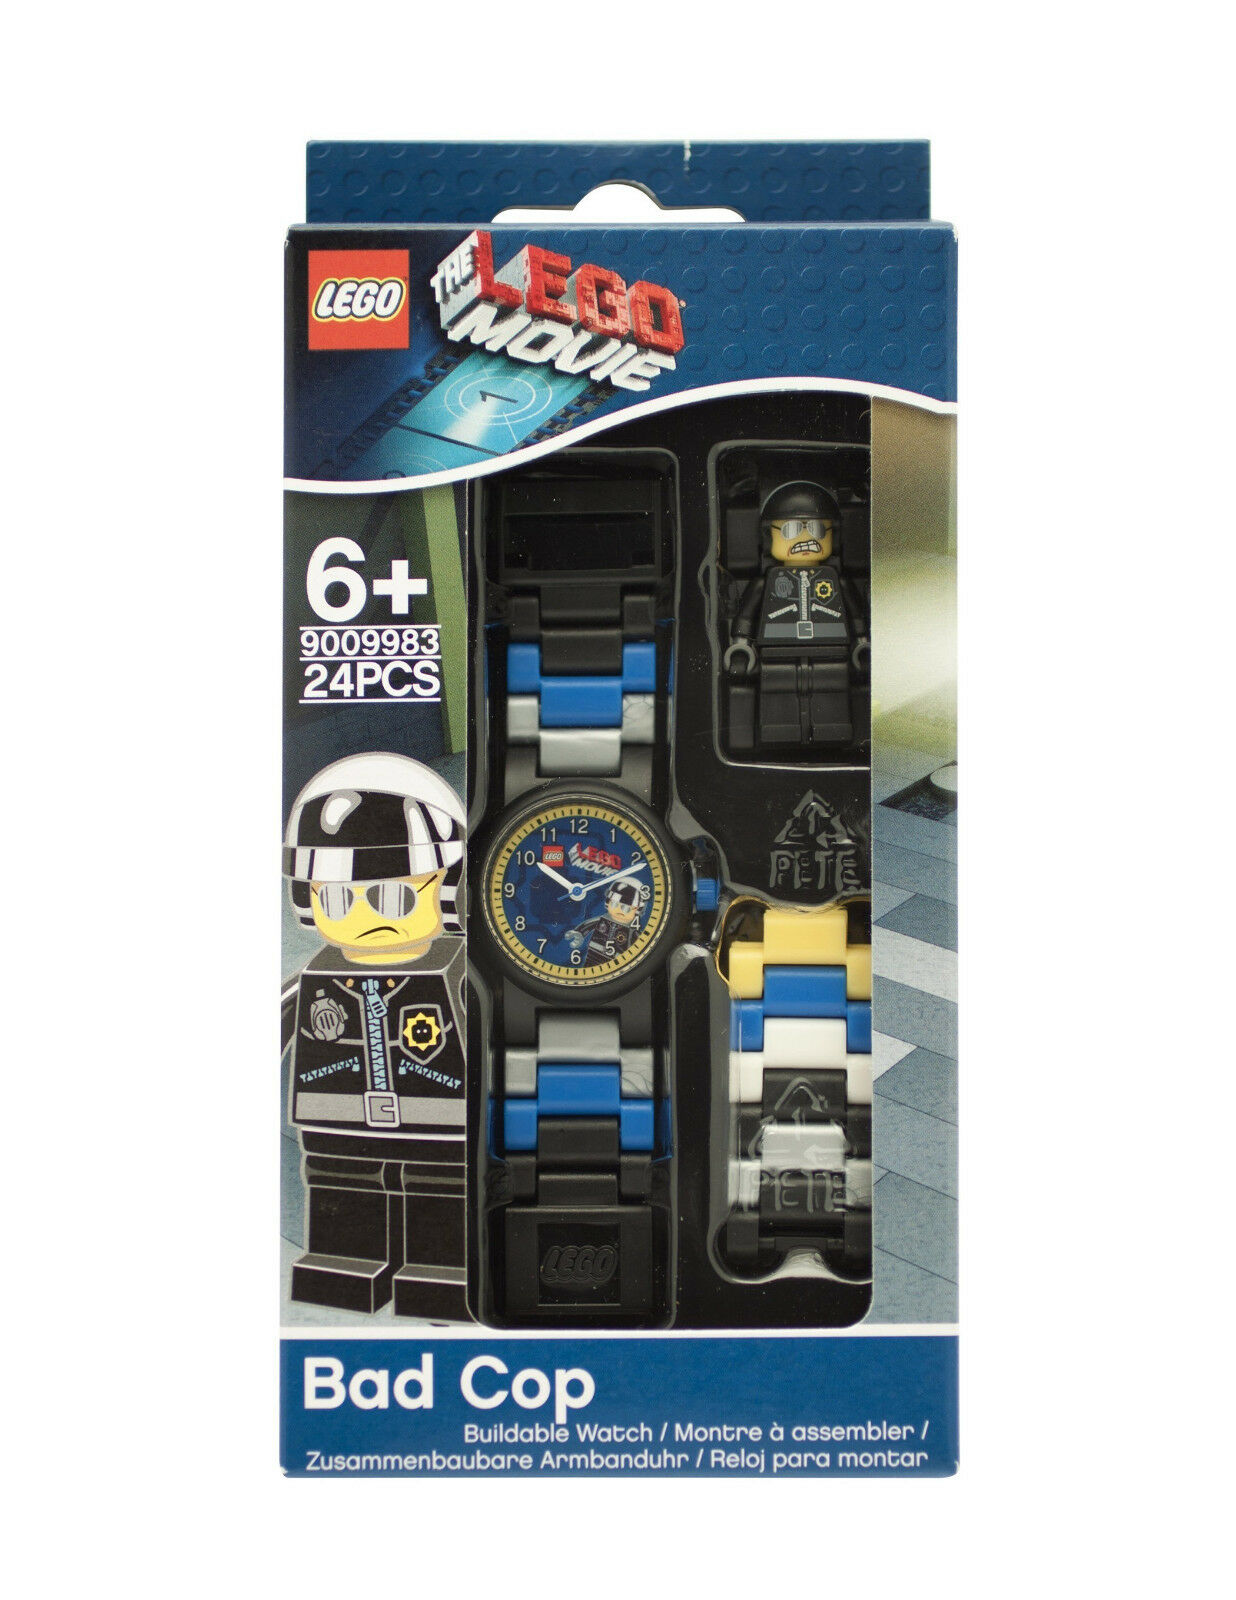 The lego movie - bad cop watch